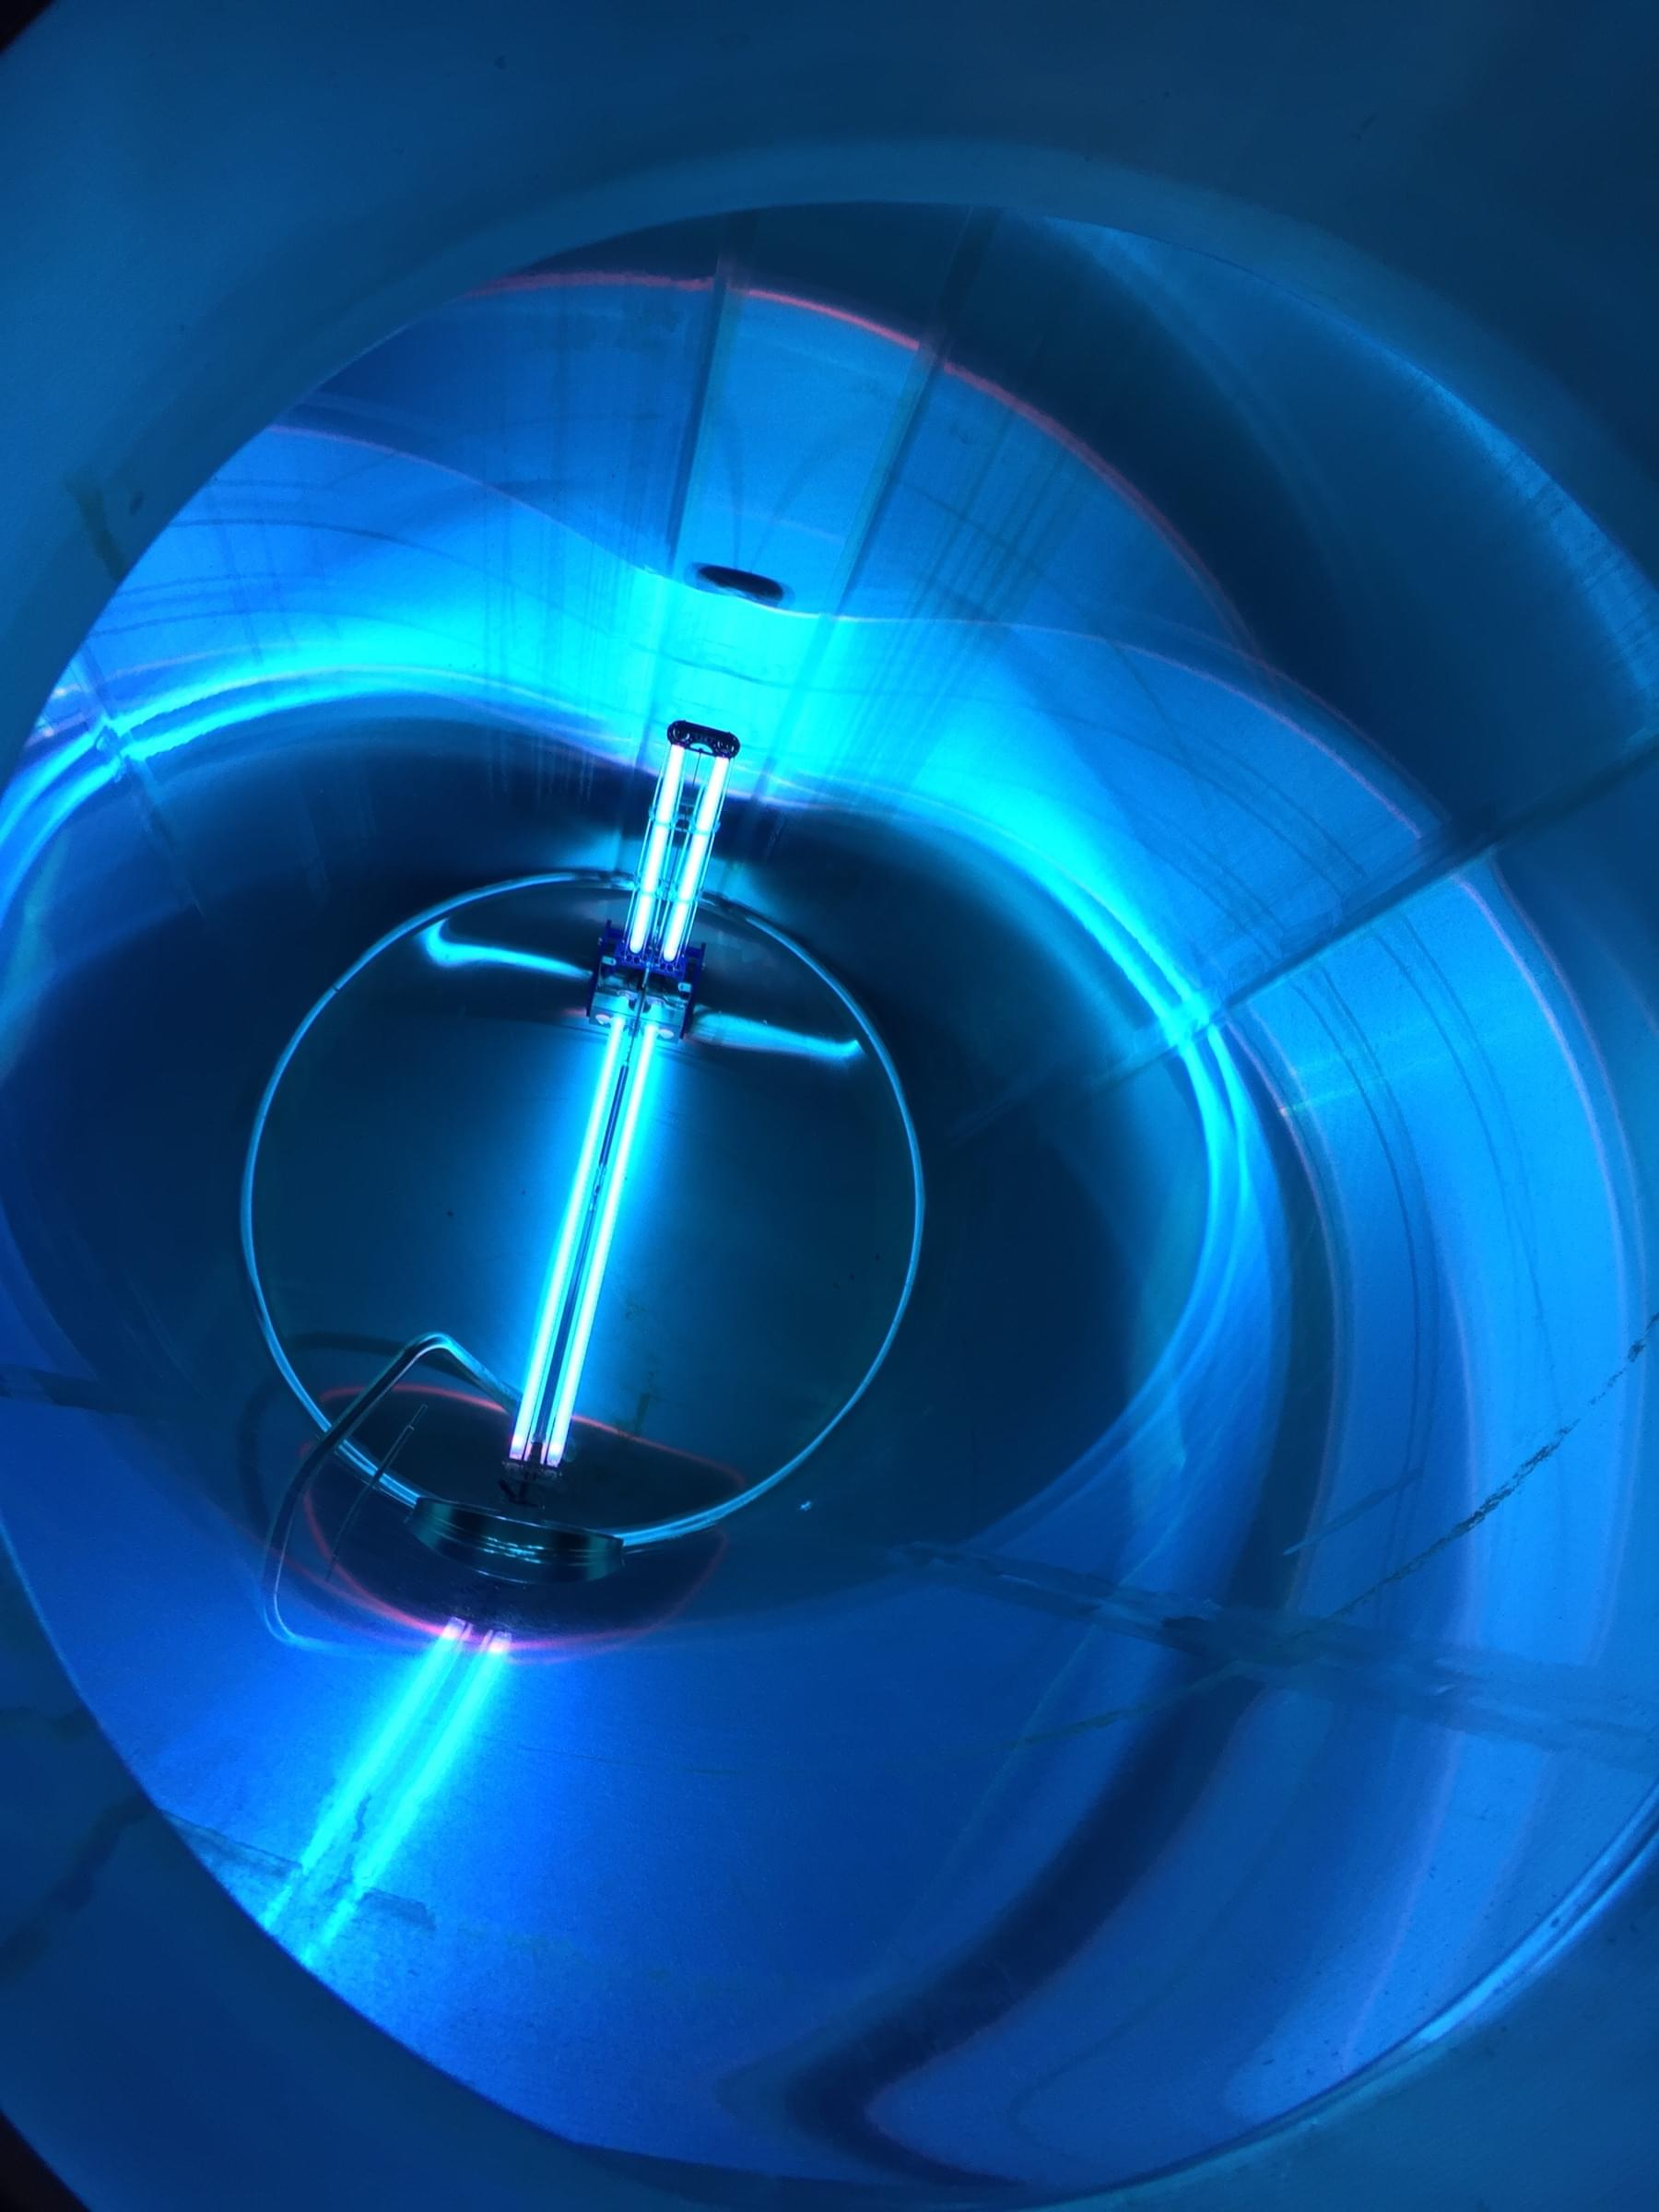 blue morph steel tank sanitization system